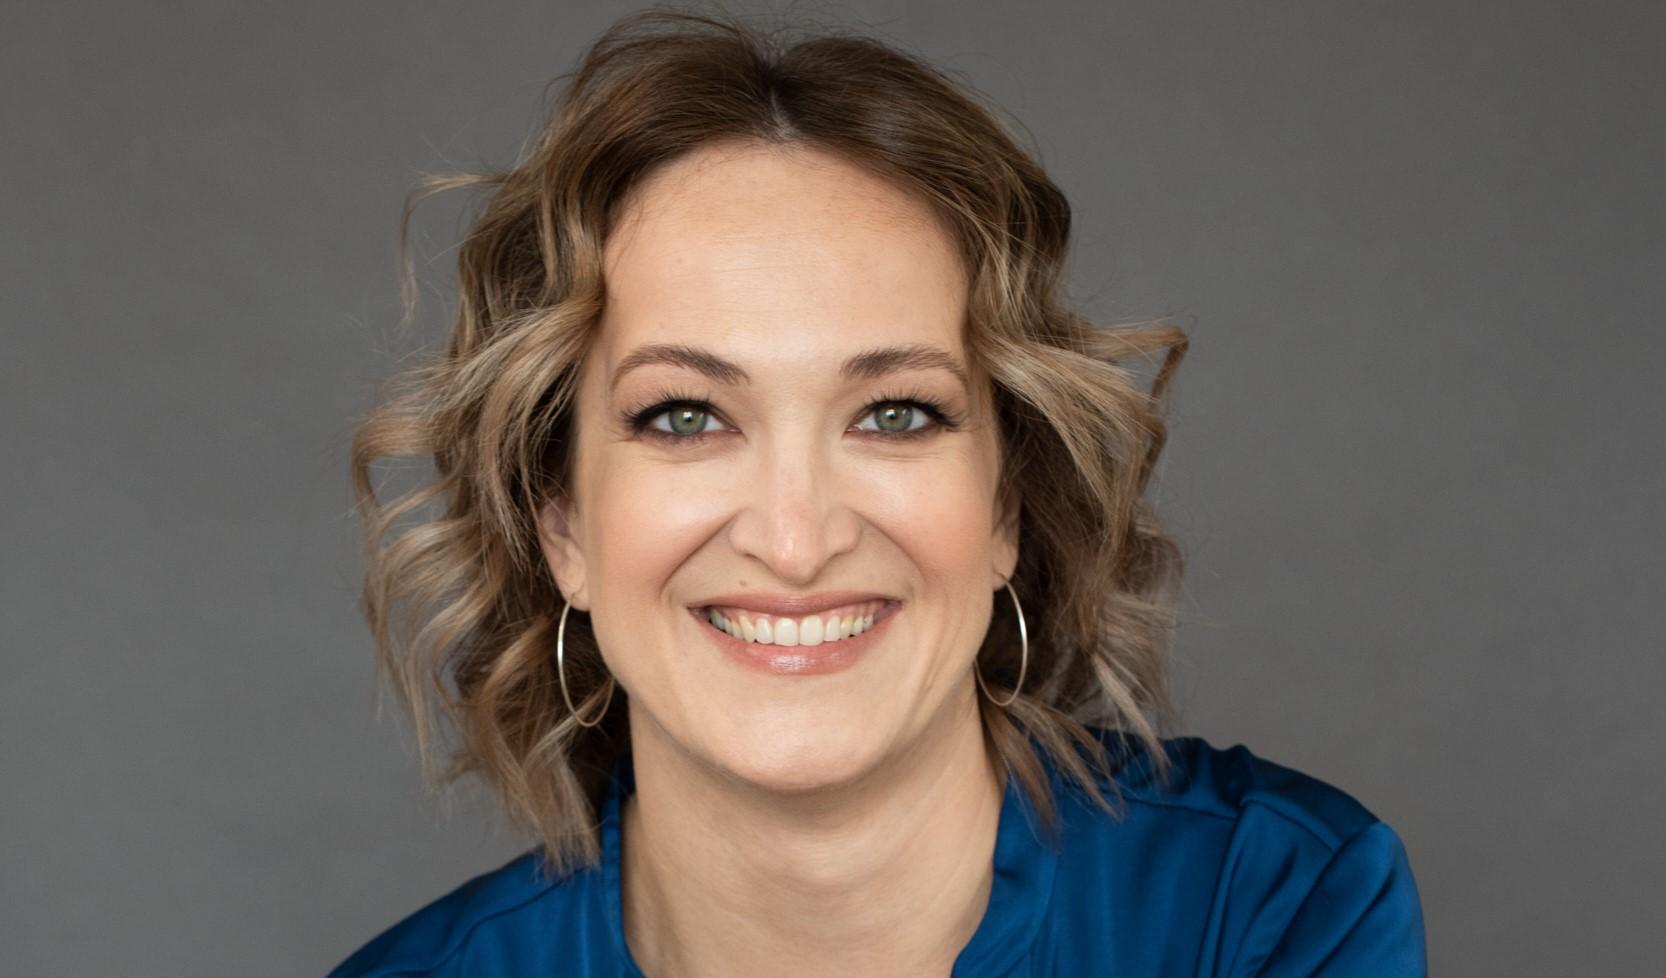 Victoria Abramova nową Prezes Zarządu Mars Polska sp. z o.o.